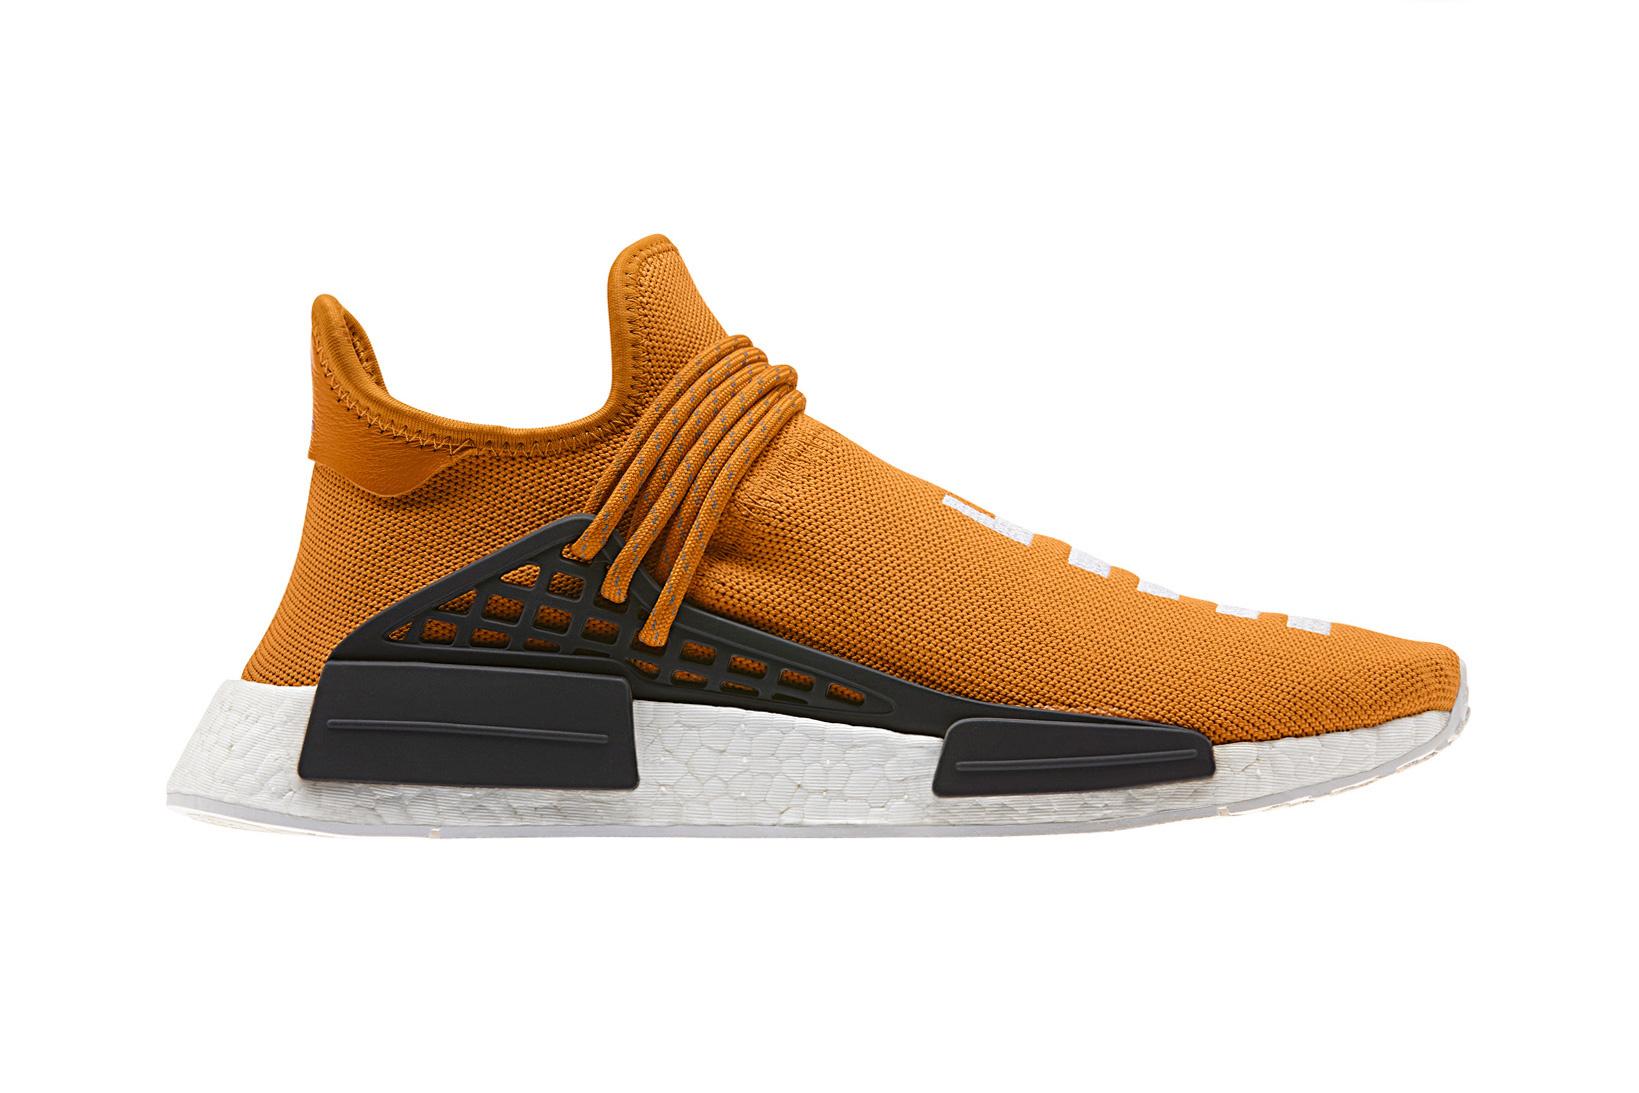 pharrell-williams-adidas-originals-hu-collection-019